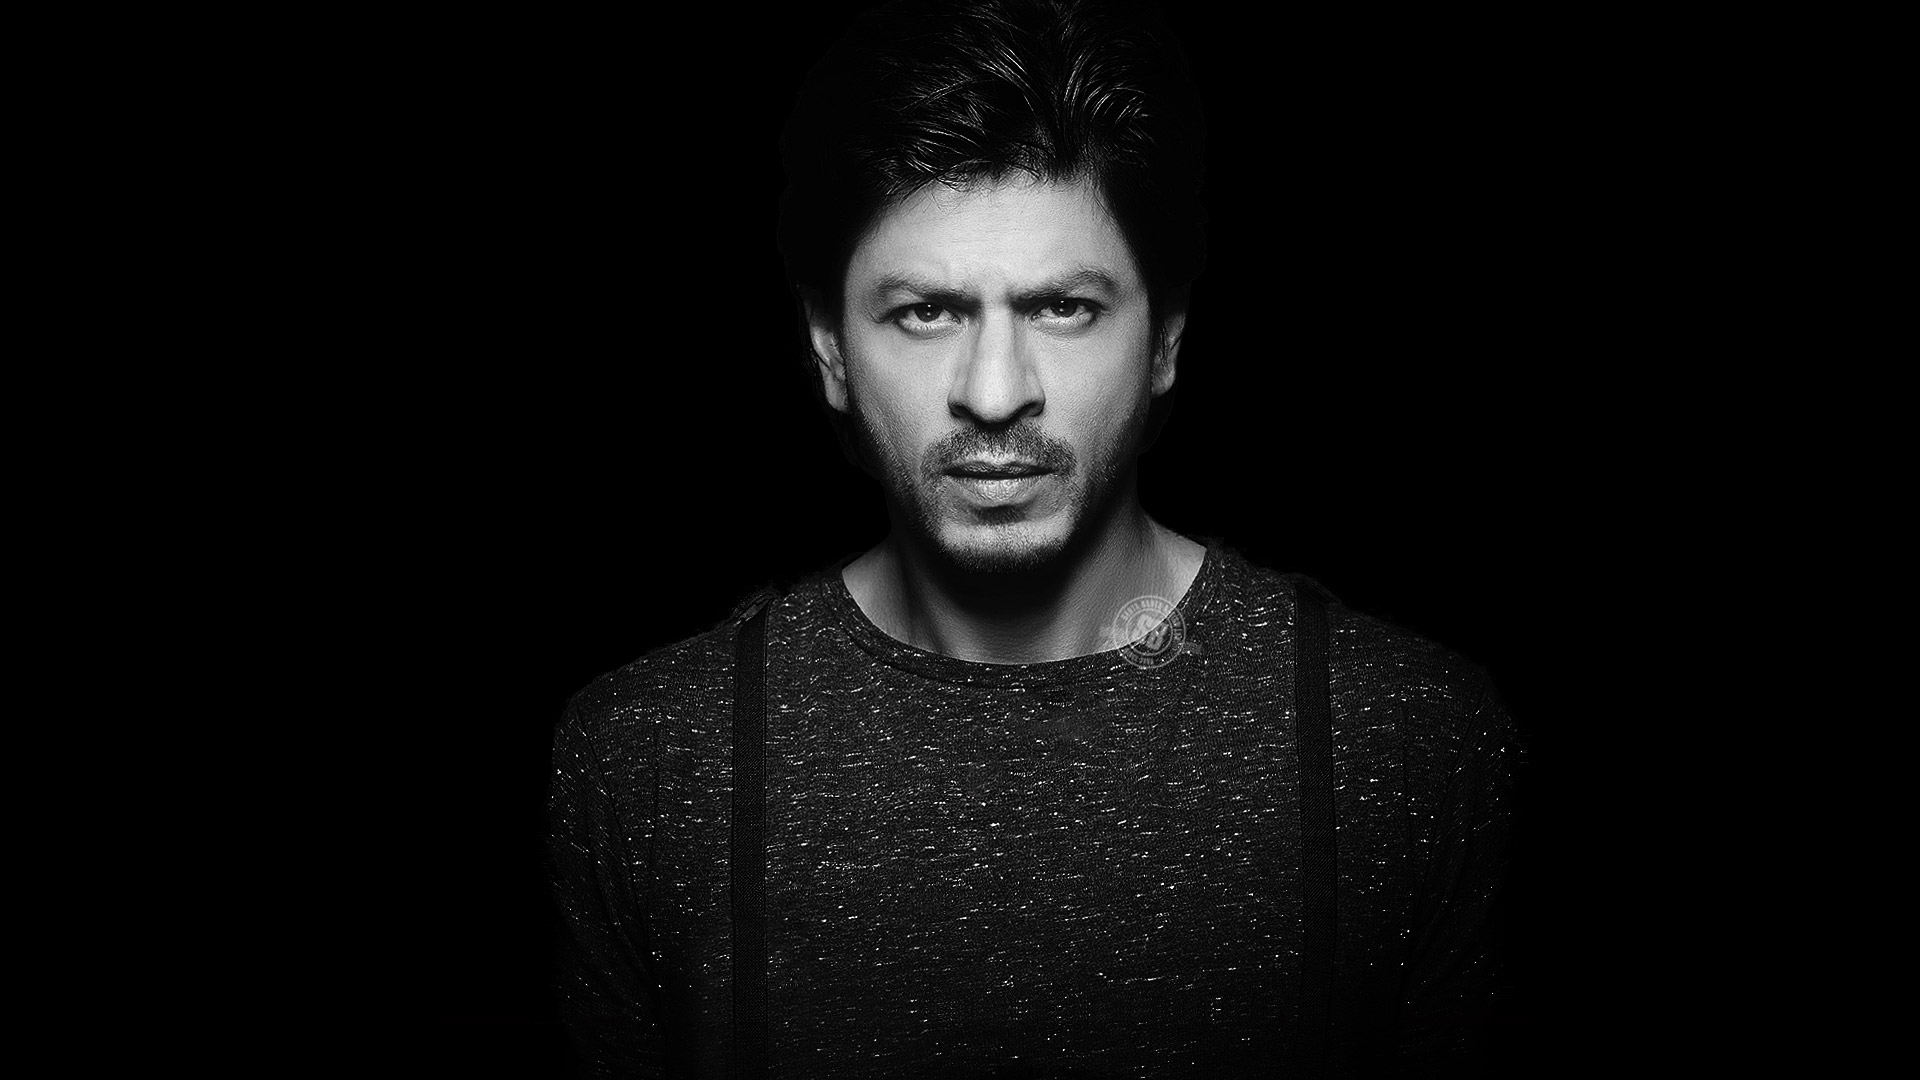 Shah Rukh Khan Computer Wallpaper